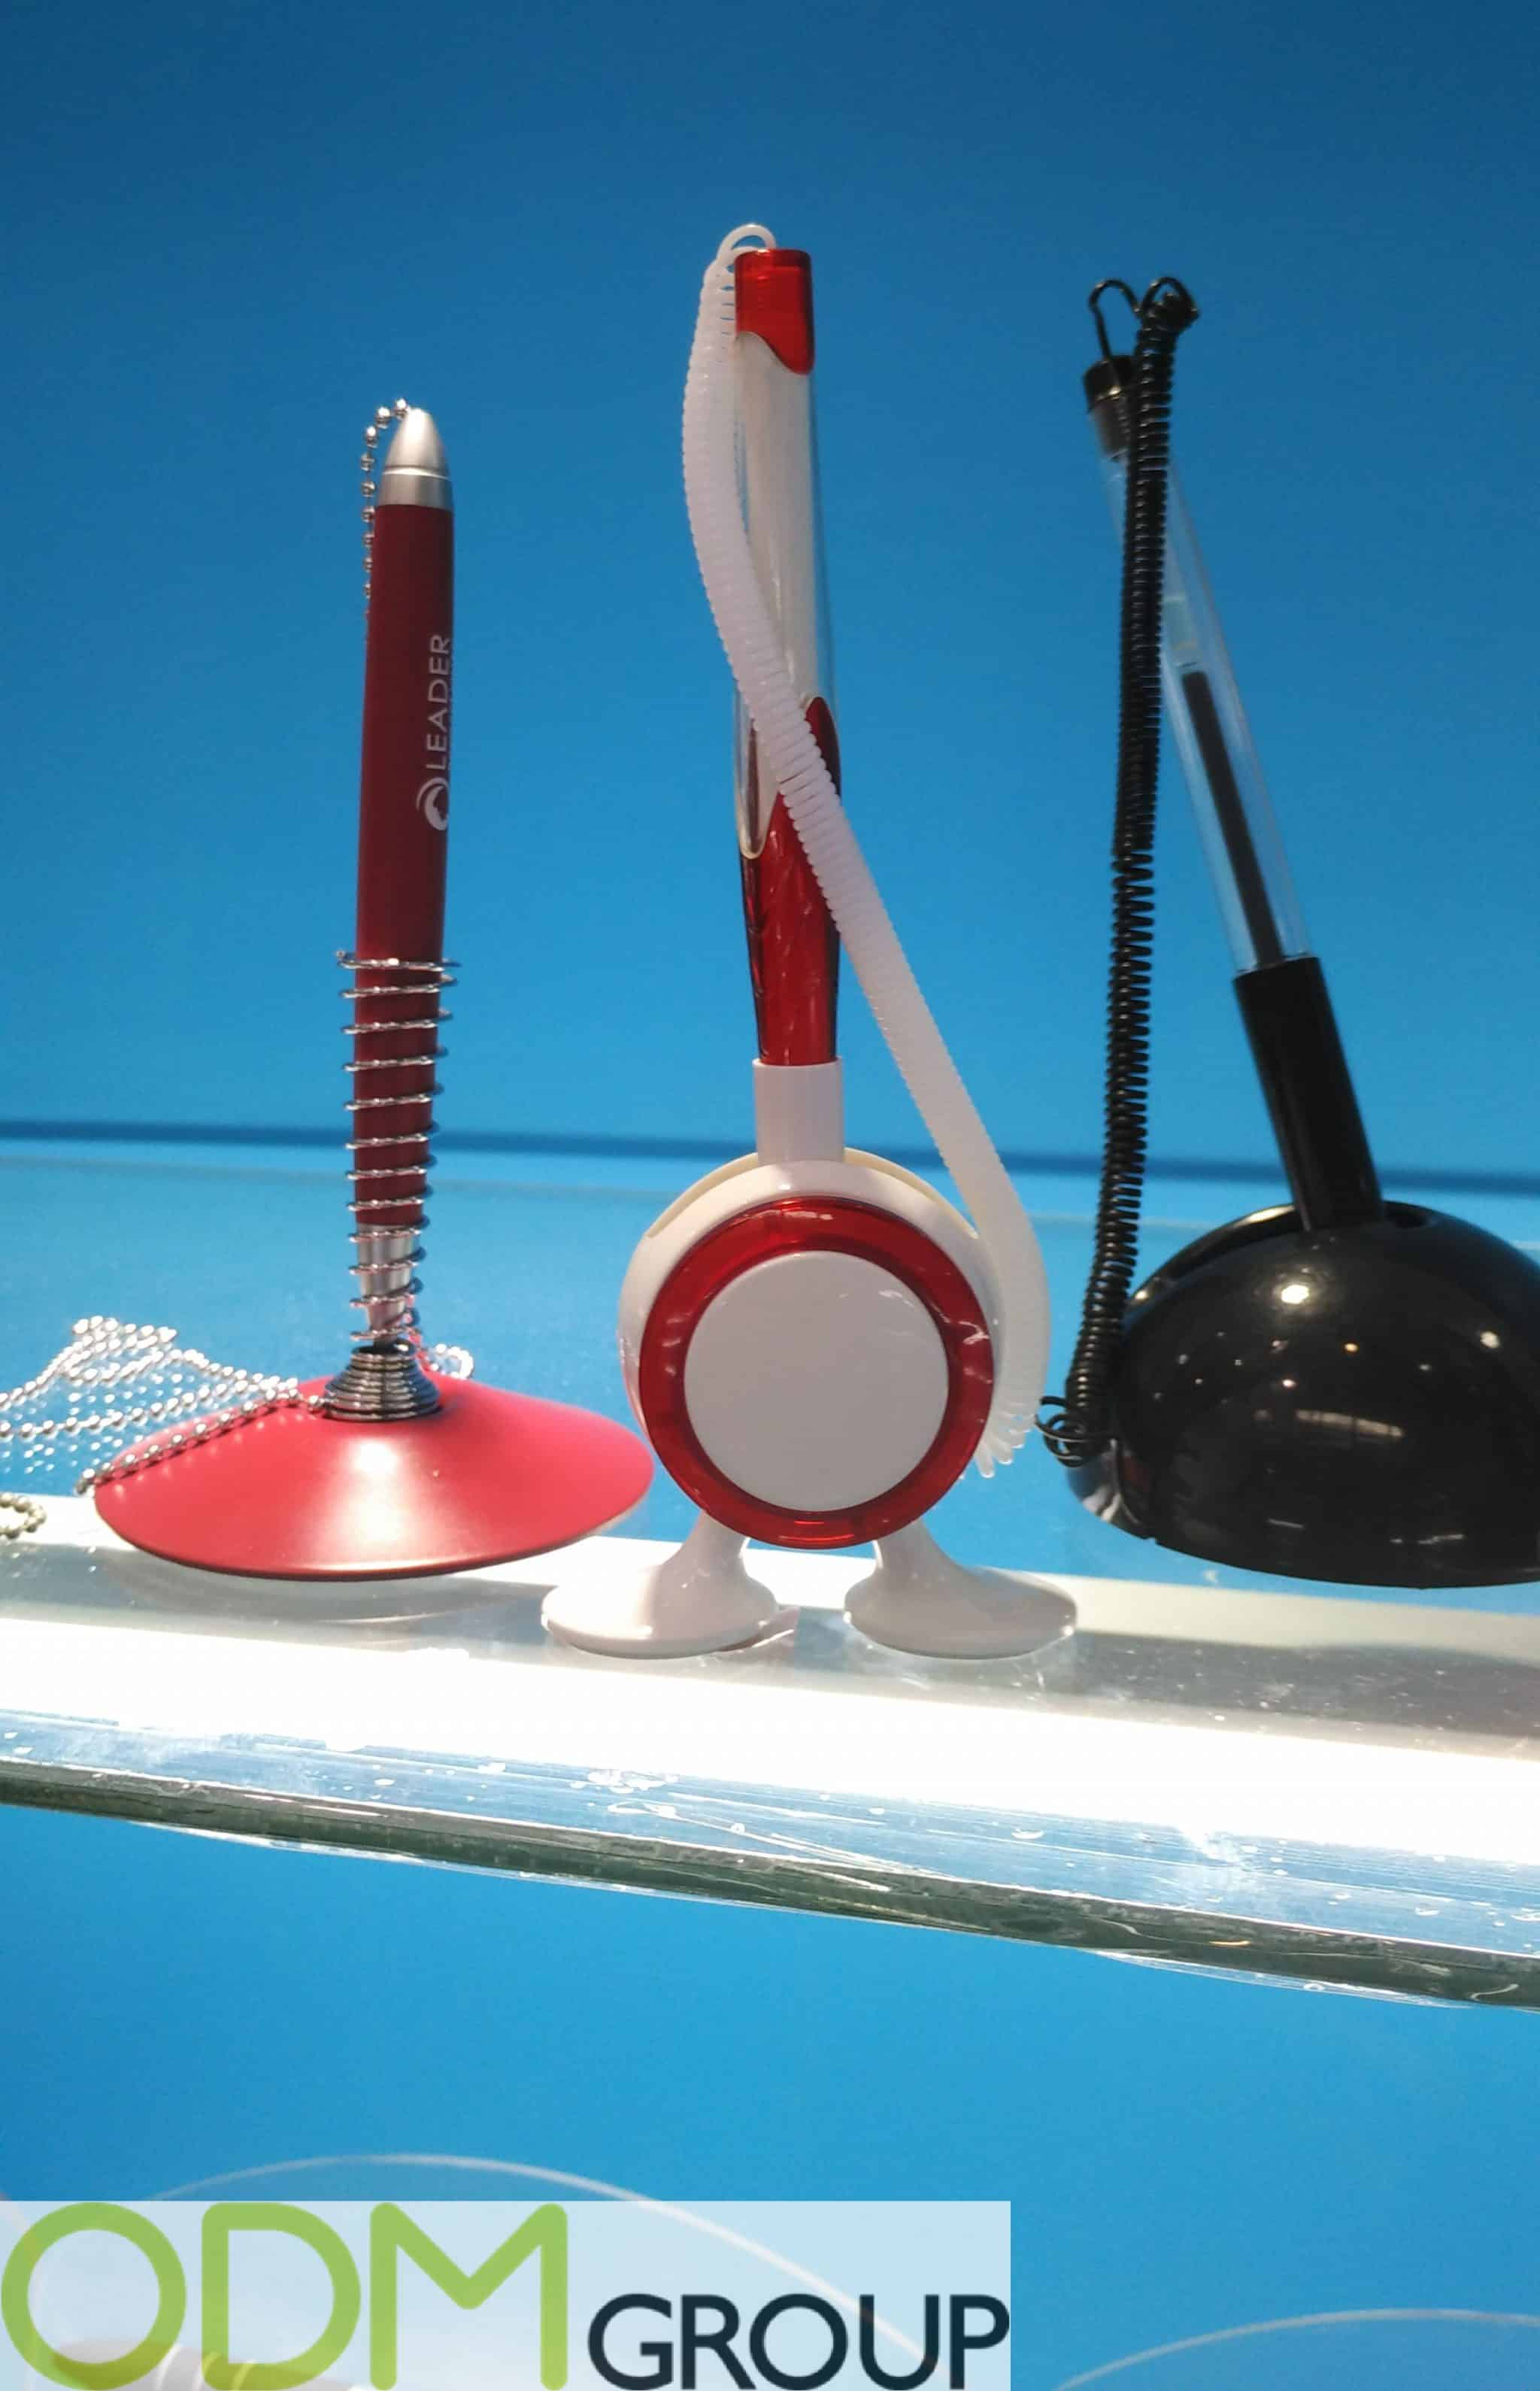 promotional office supplies idea u2013 counter top pen holders idea office supplies67 supplies